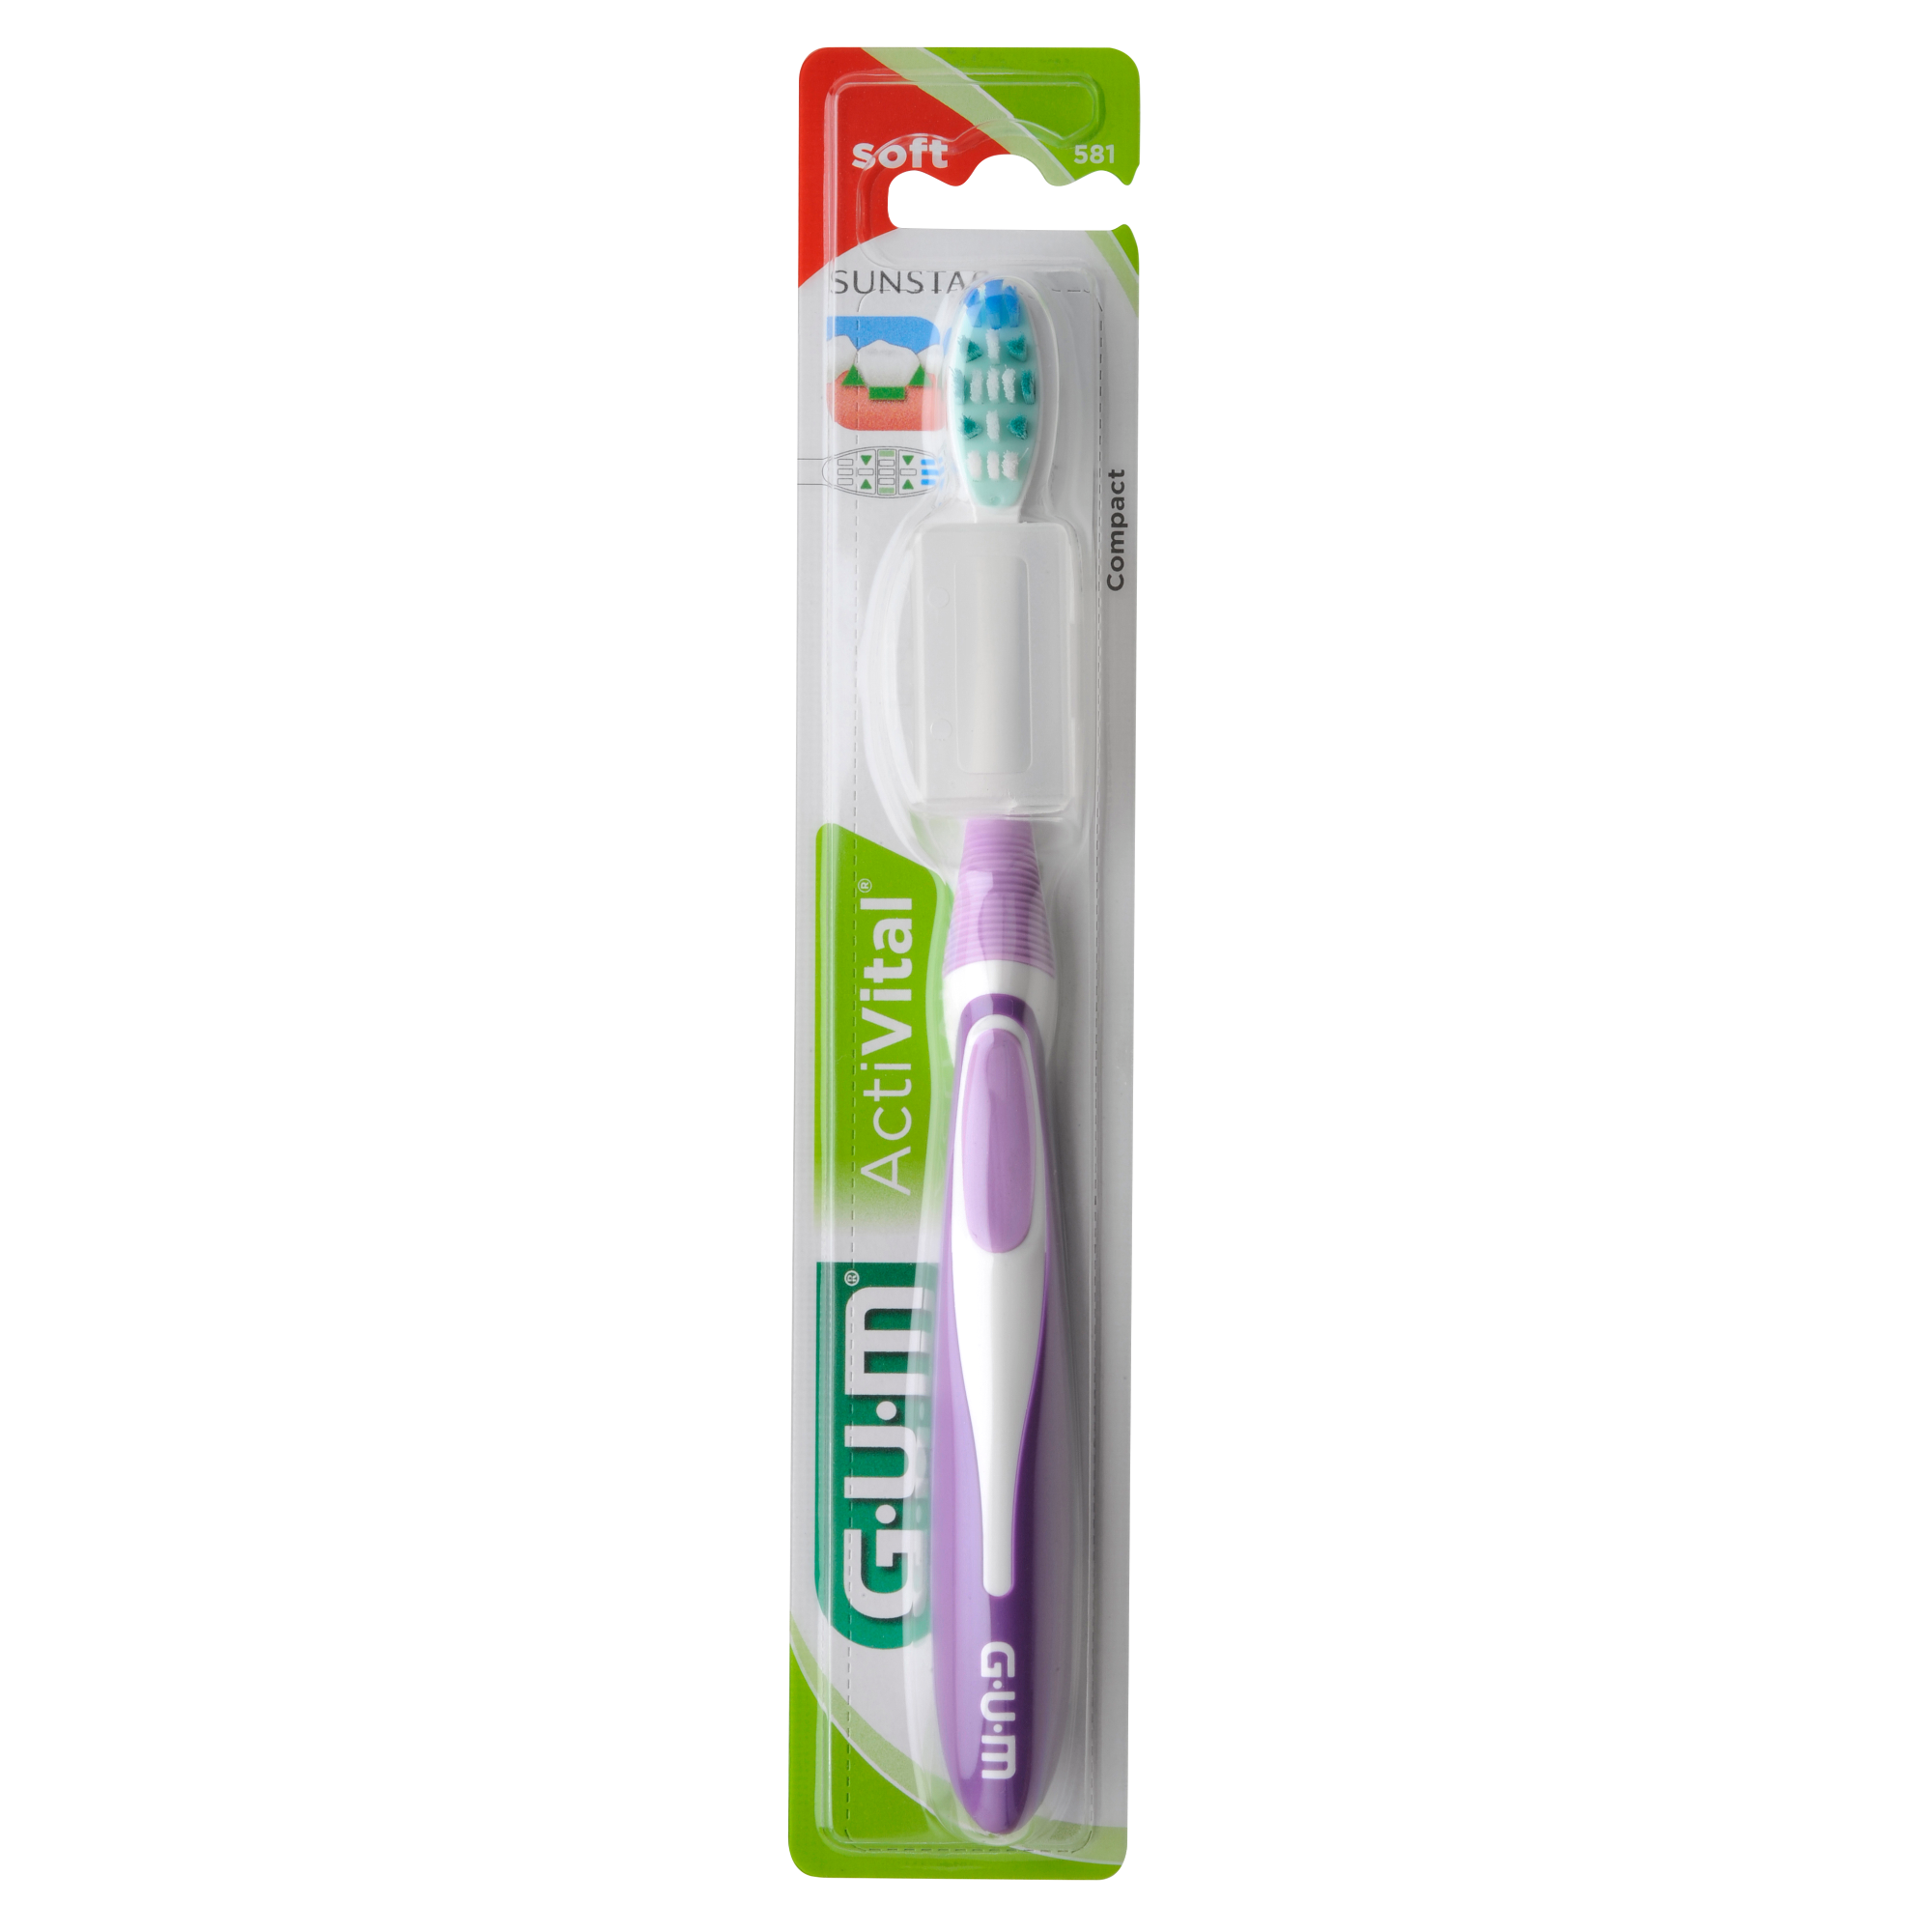 Gum ActiVital Compact Soft Οδοντόβουρτσα με Θήκη Προστασίας (581) – μωβ